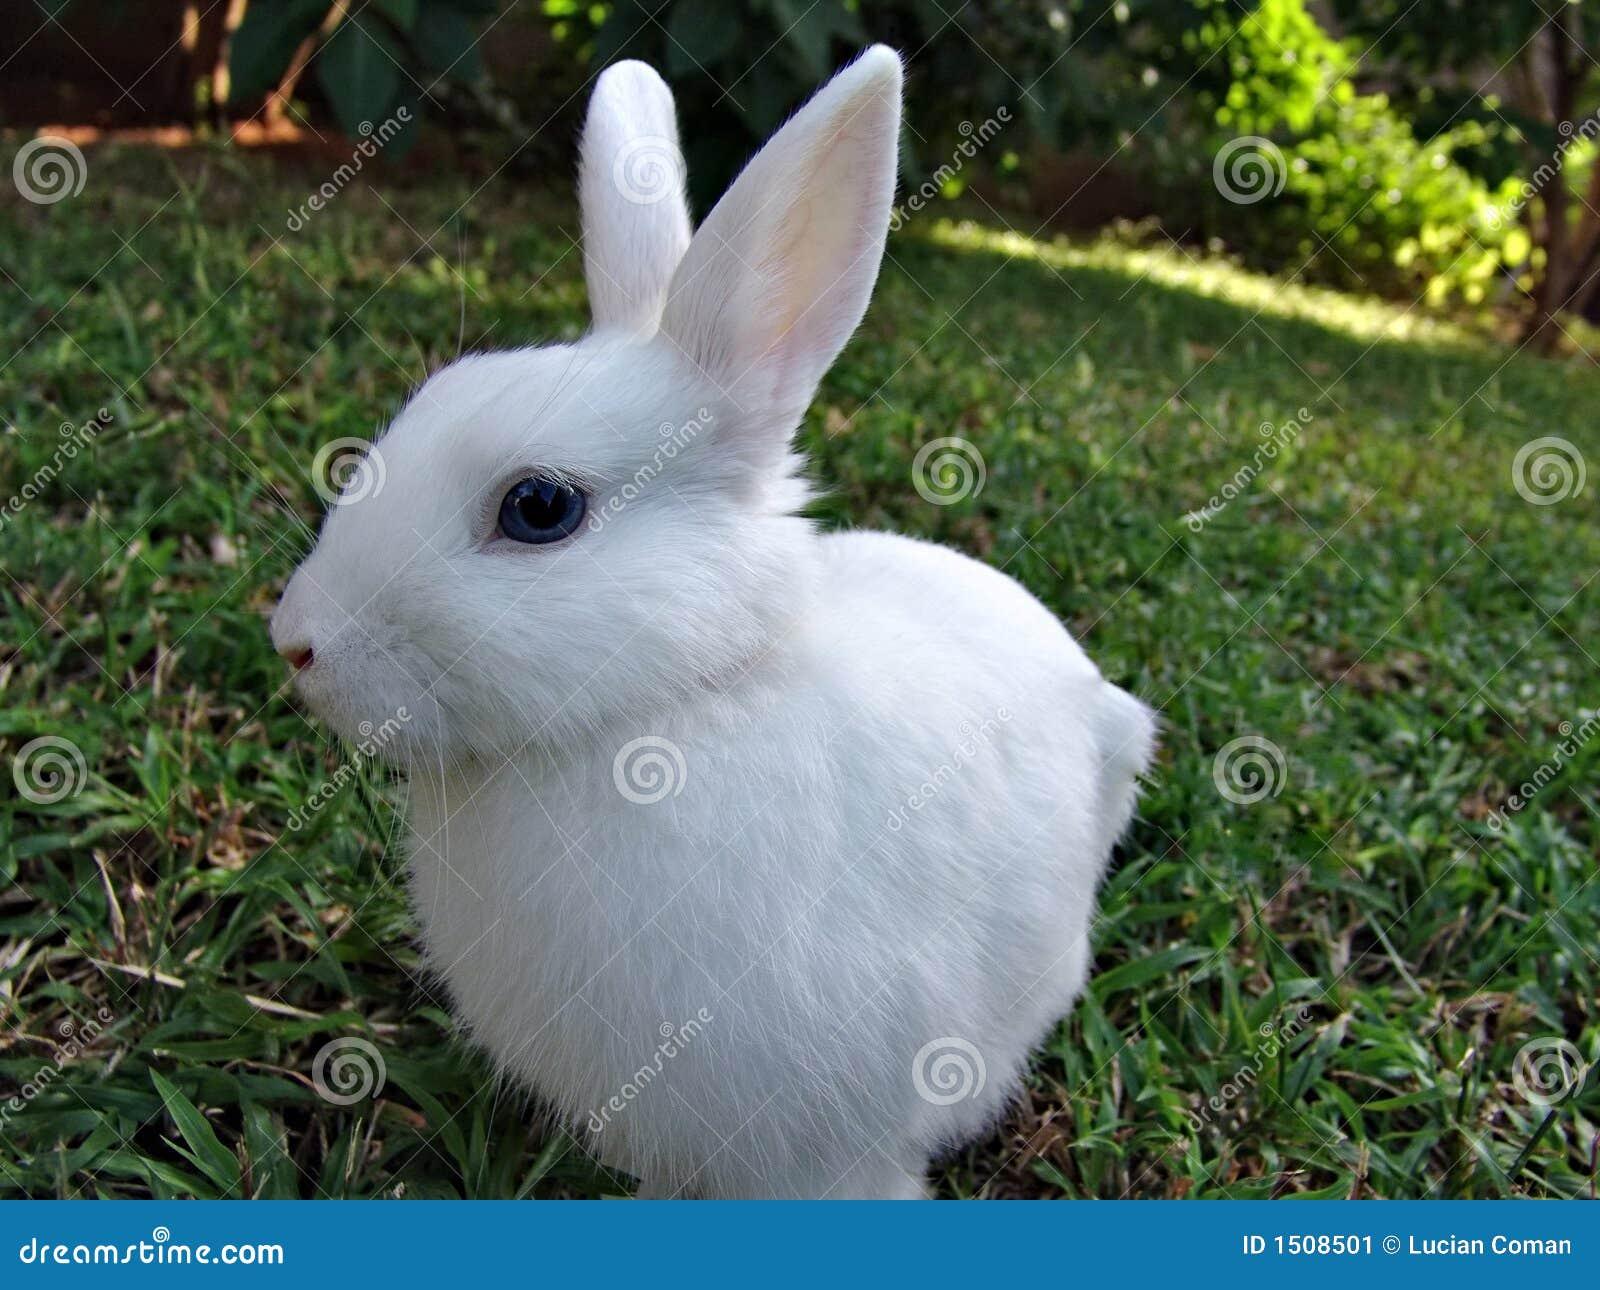 White rabbit stock image. Image of happy, greeting, decor ...